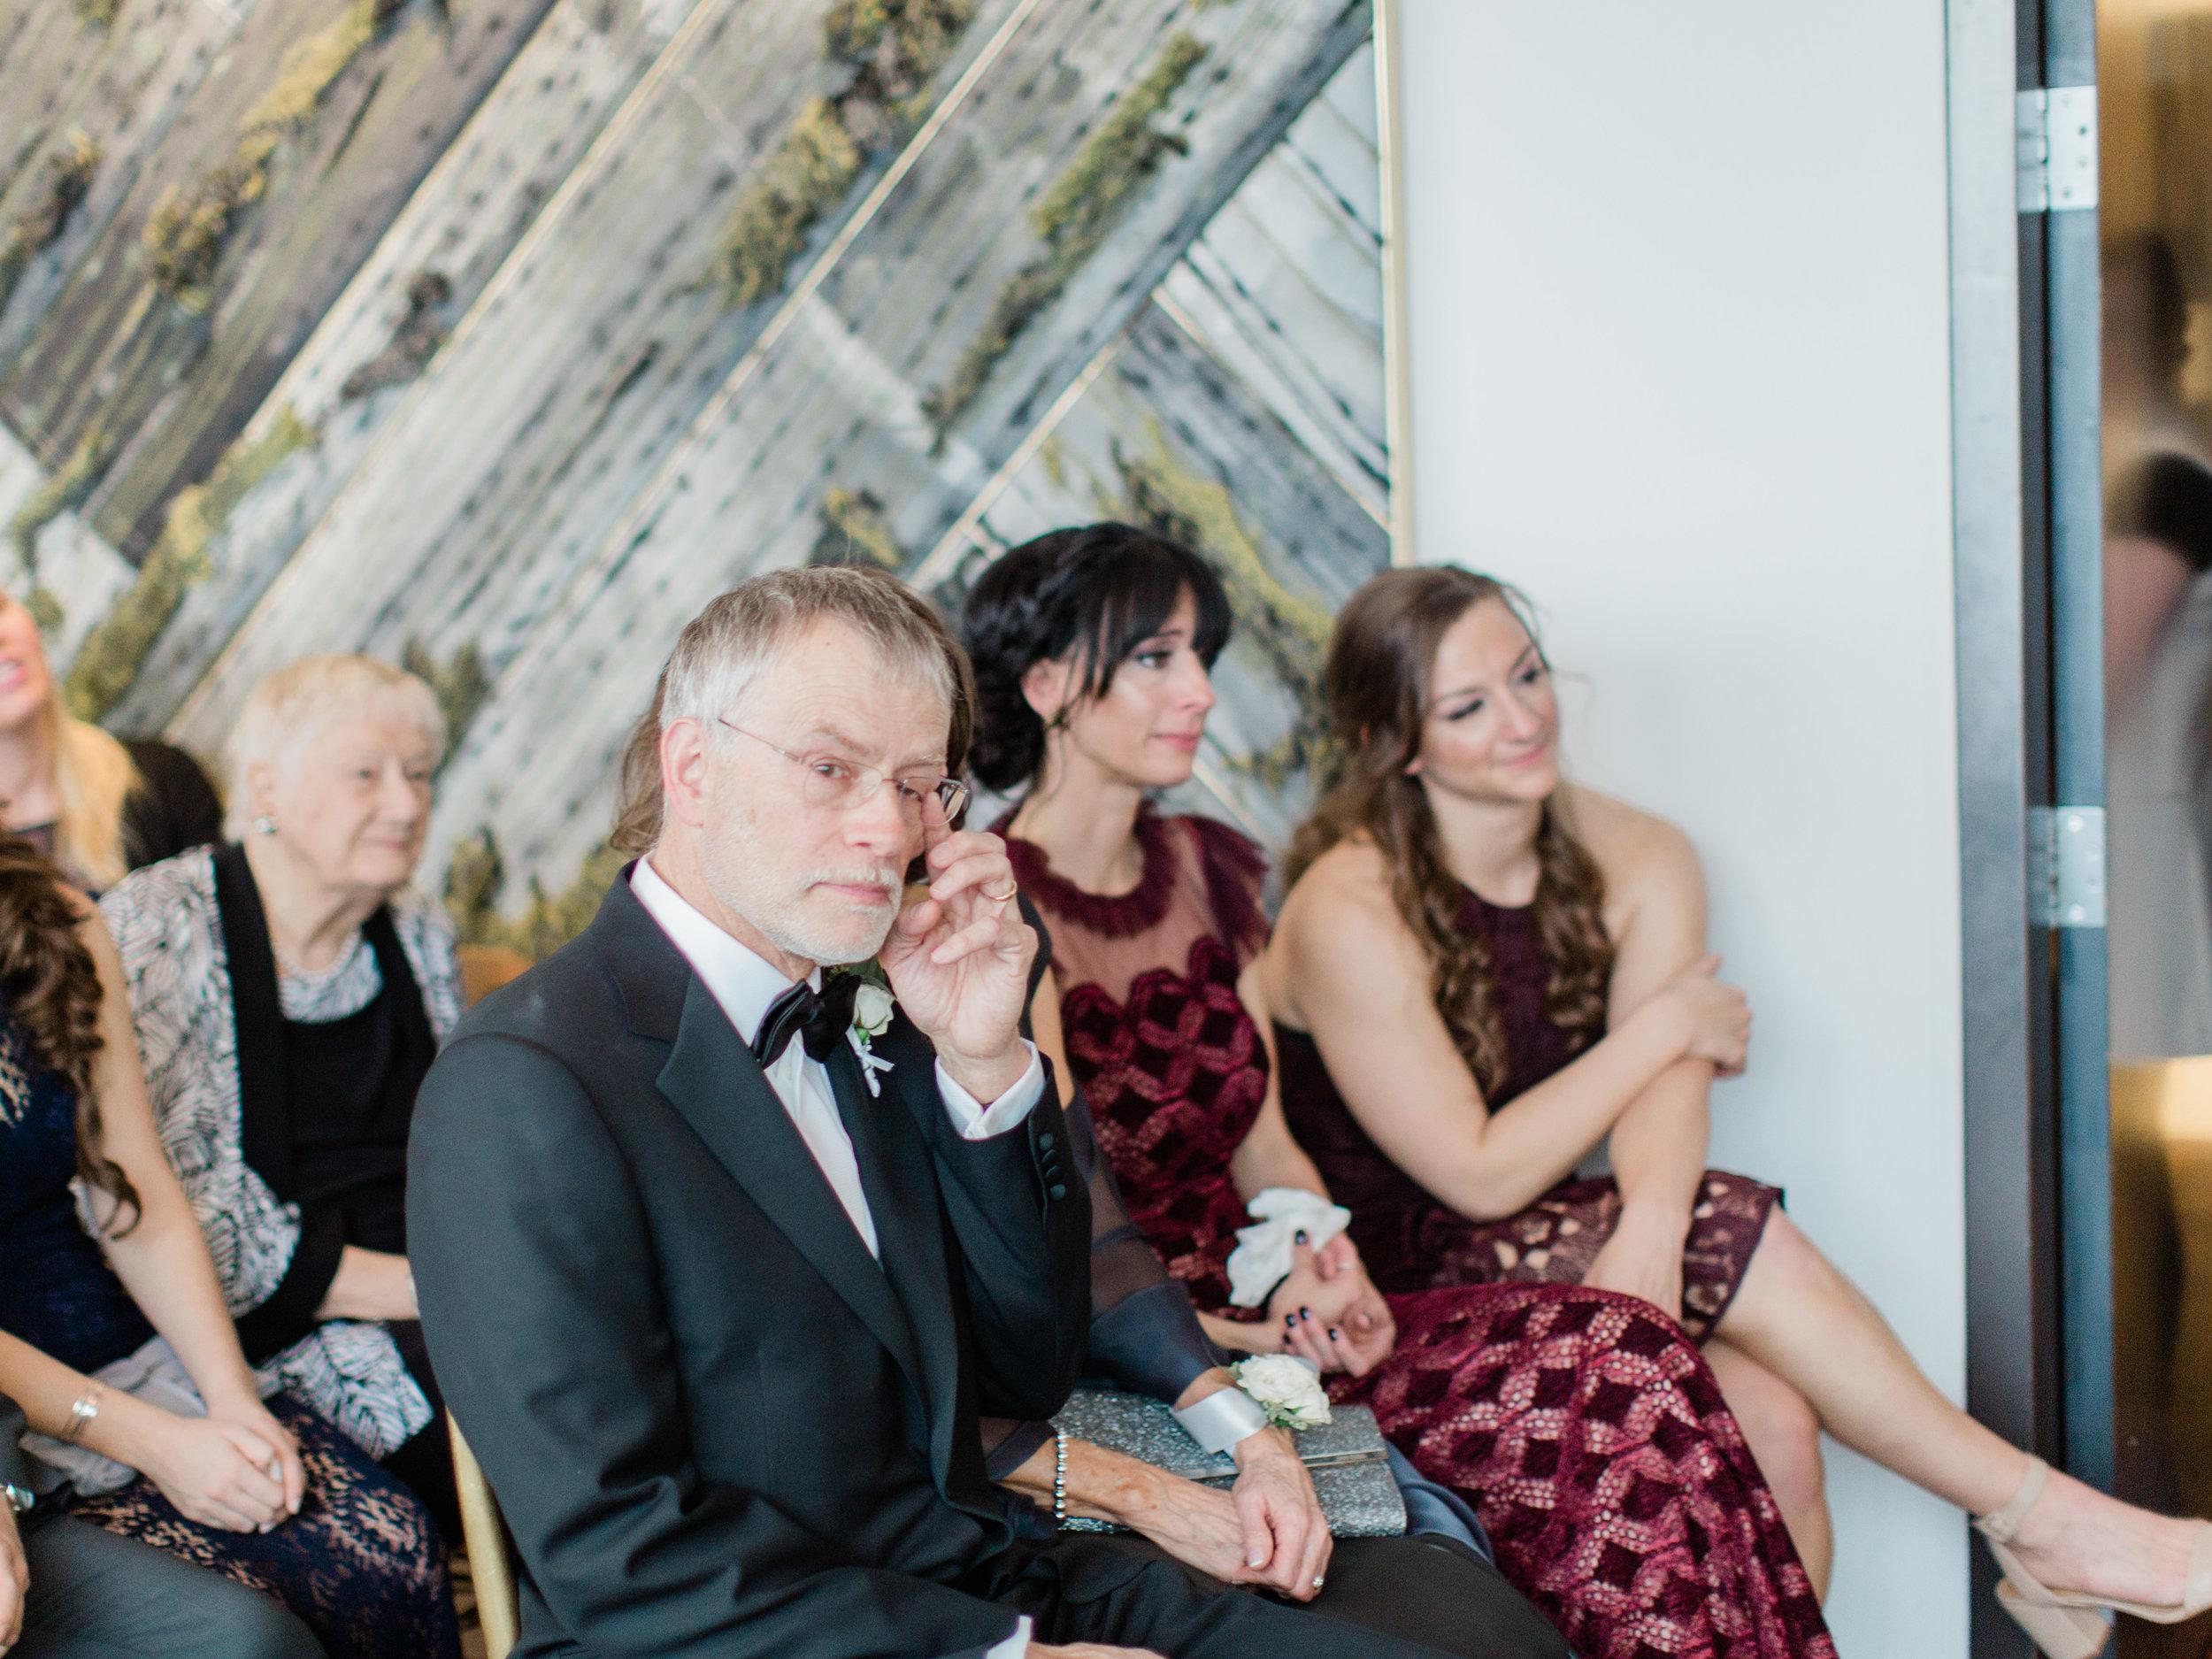 Toronto-wedding-photographer-downtown-winter-wedding-intimate-restaurant-canoe138.jpg